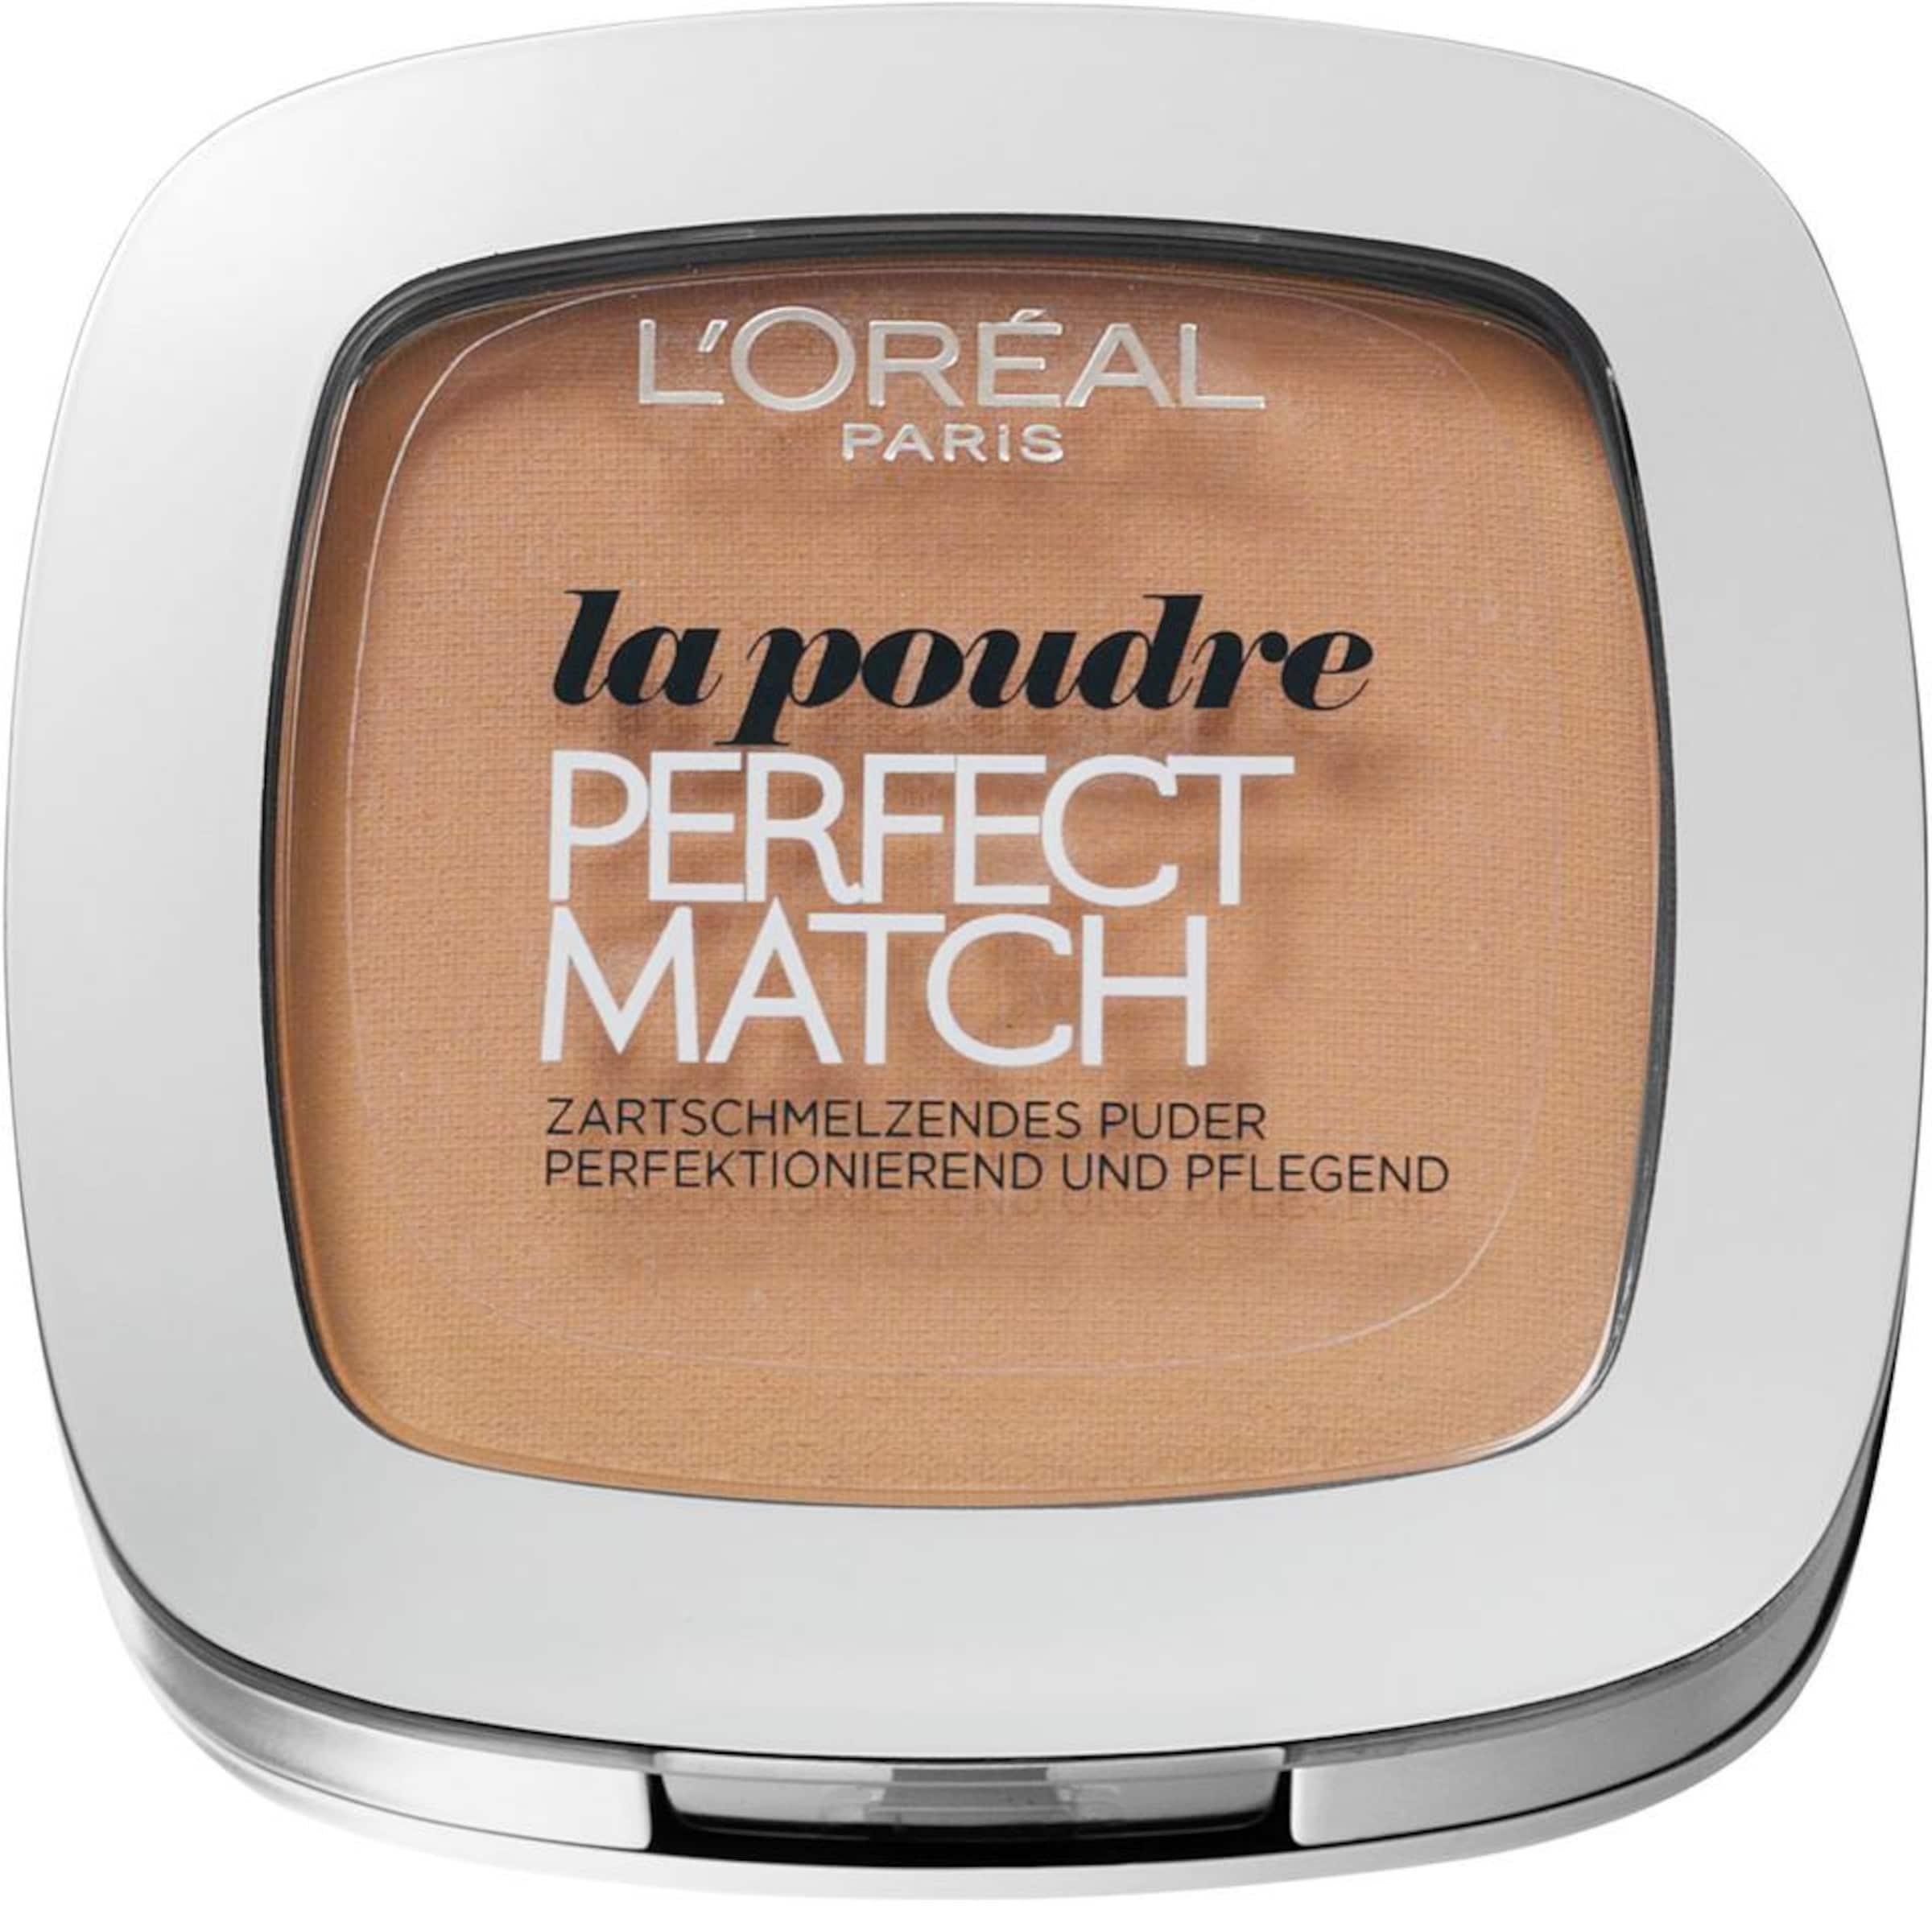 Outlet Mode-Stil L'Oréal Paris 'Perfect Match Compact Puder' Puder Zum Verkauf Großhandelspreis Verkauf Aus Deutschland Steckdose Vermarktbaren OhvjOMB